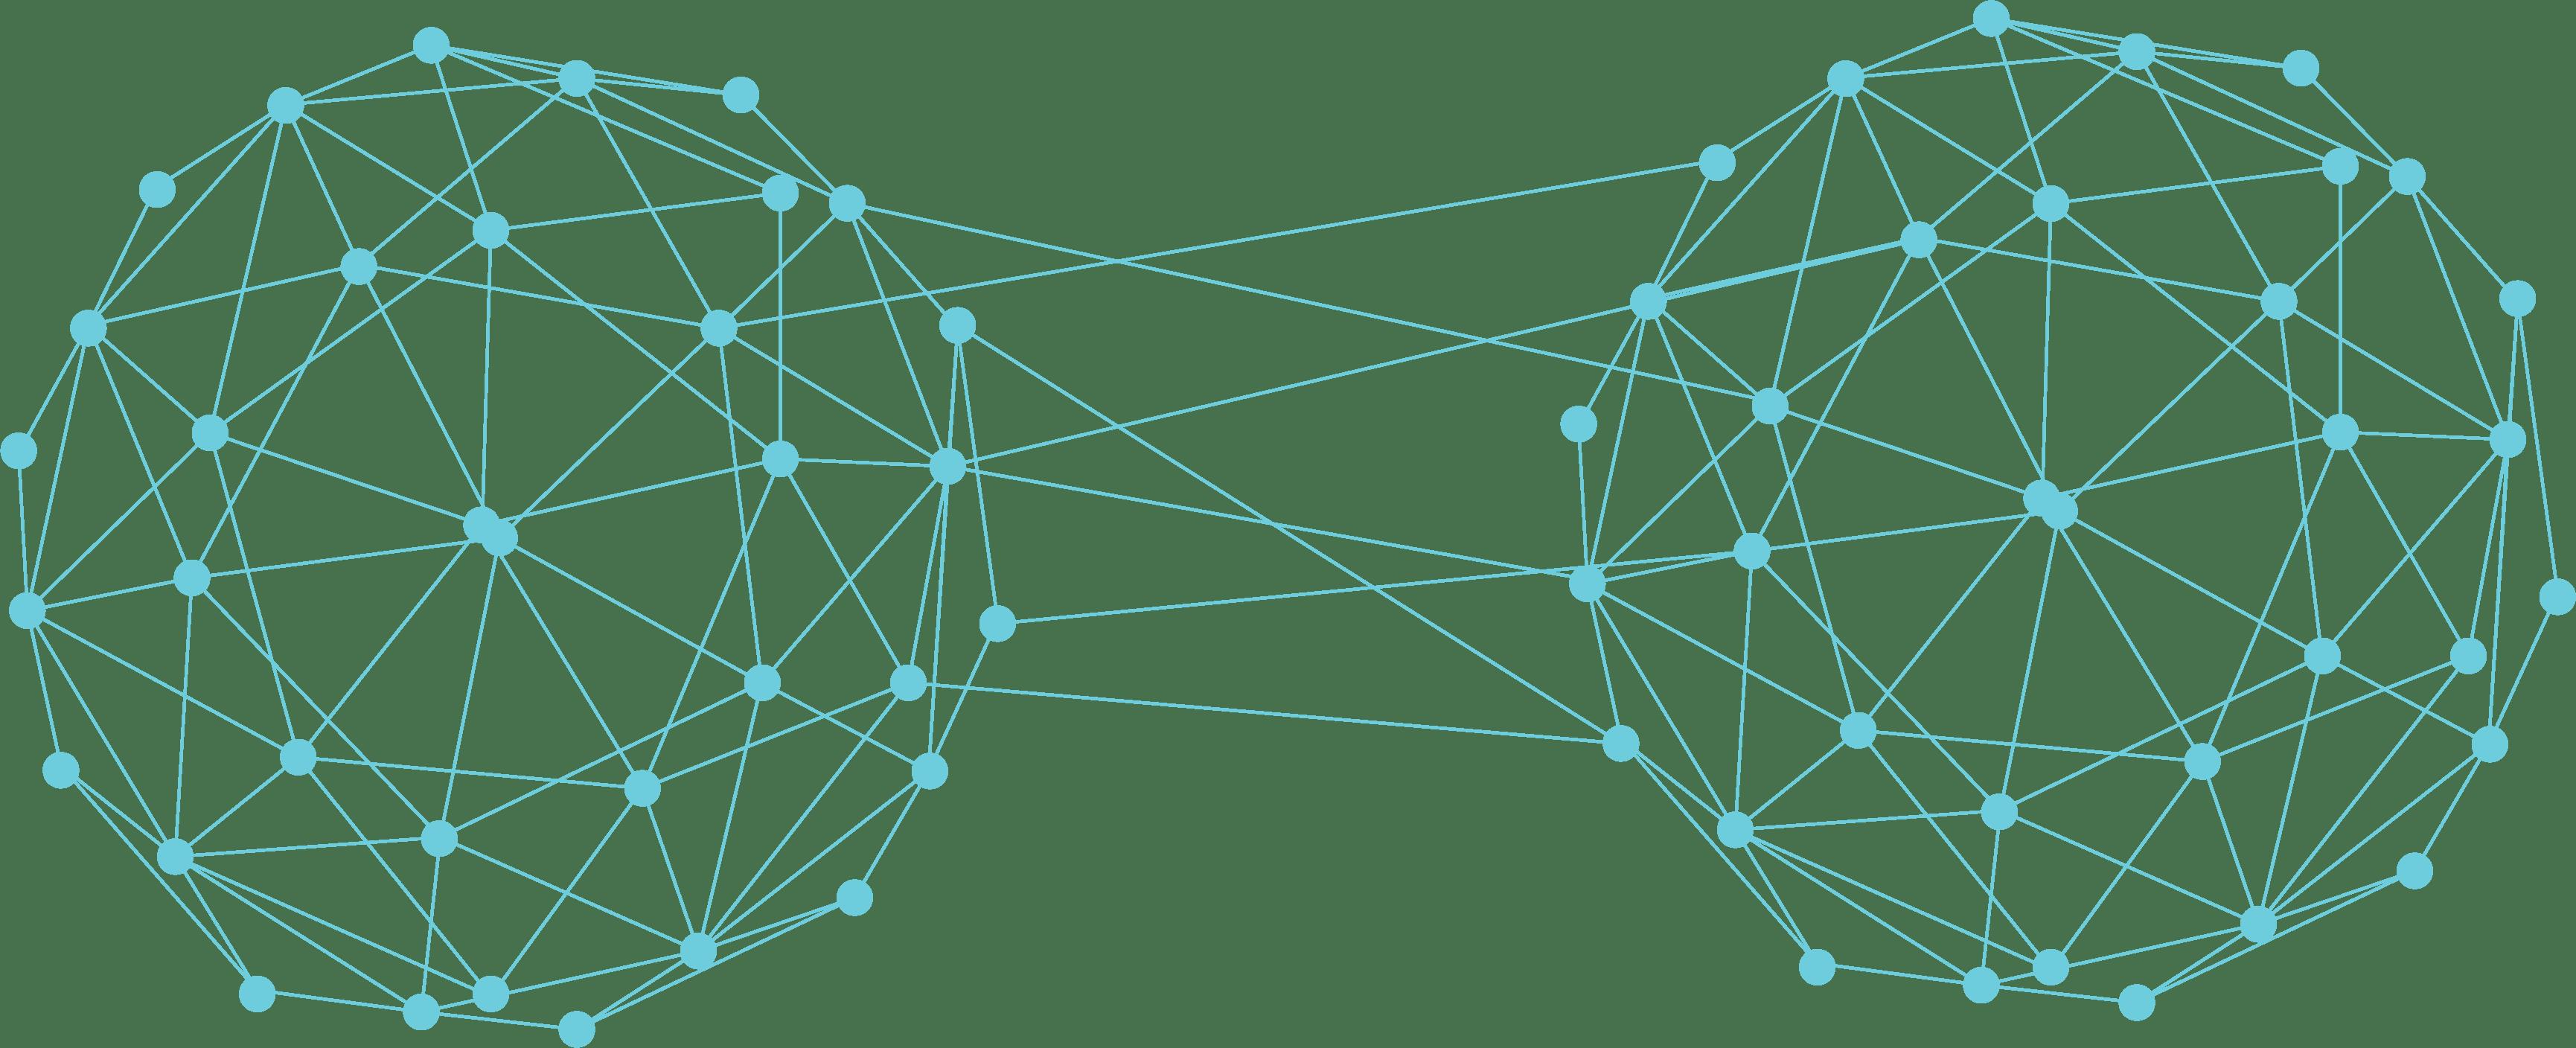 TON - blockchain platform of Telegram messenger with